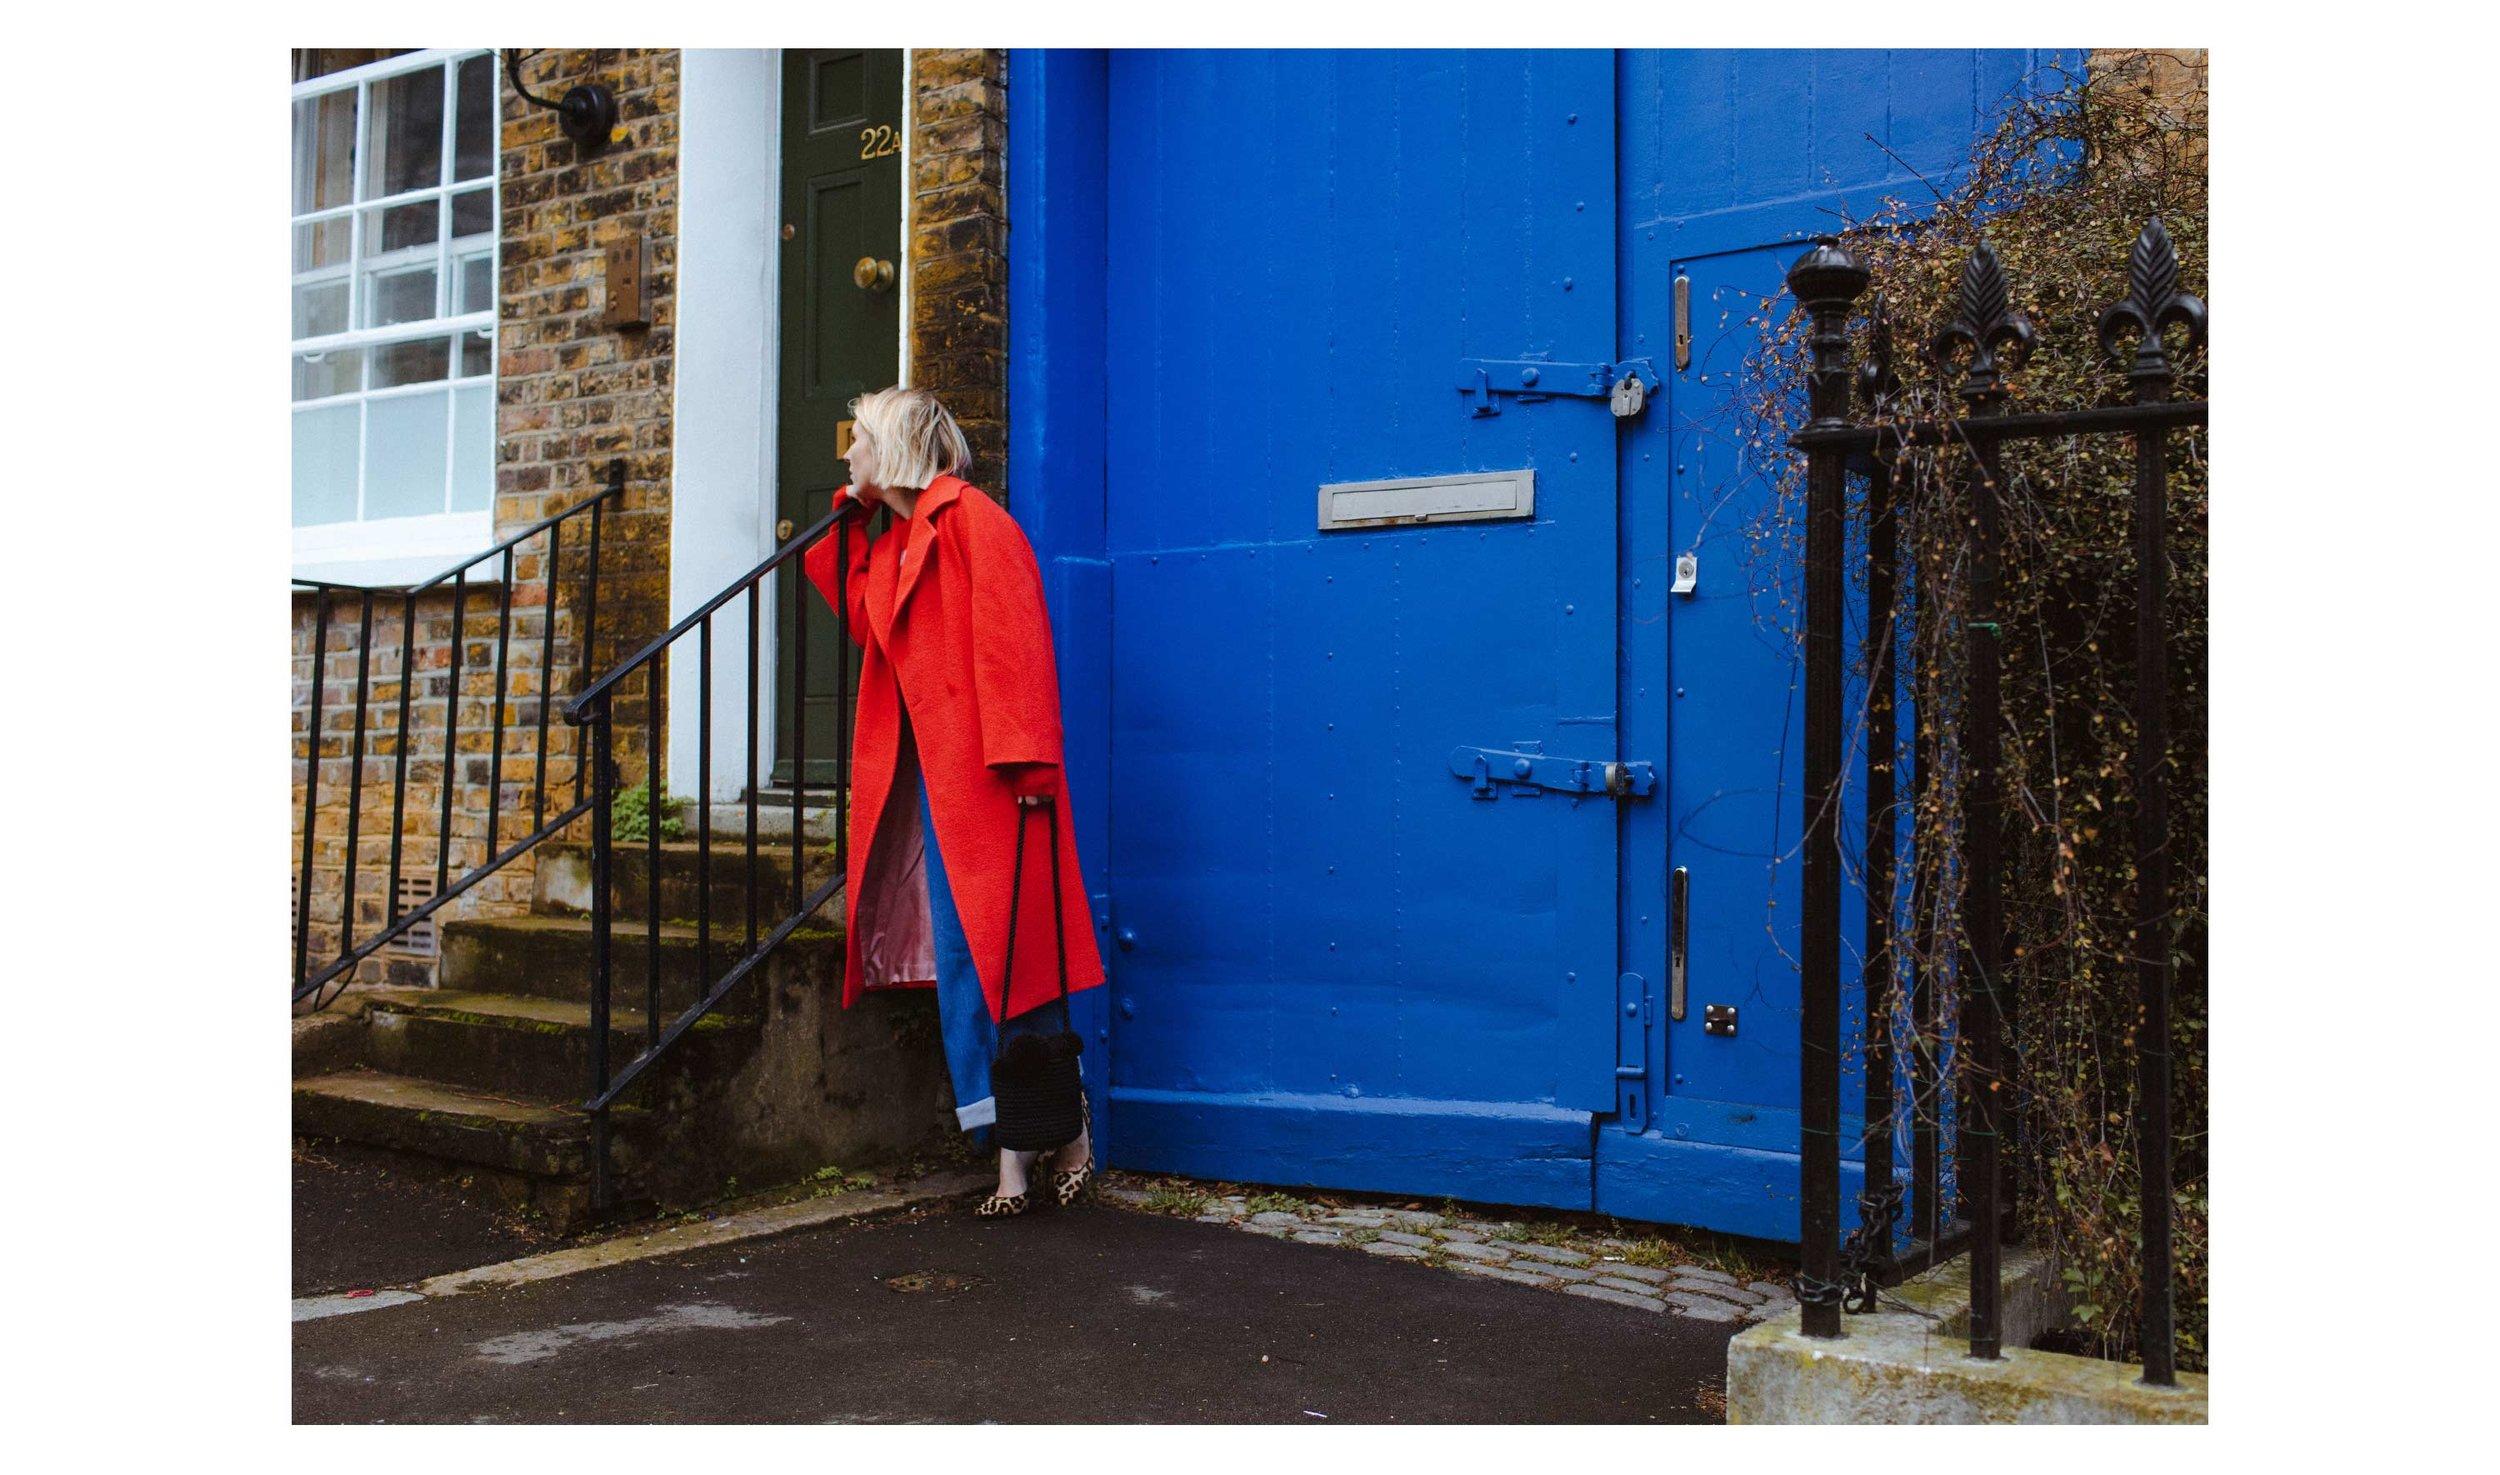 Red-coat-10.jpg